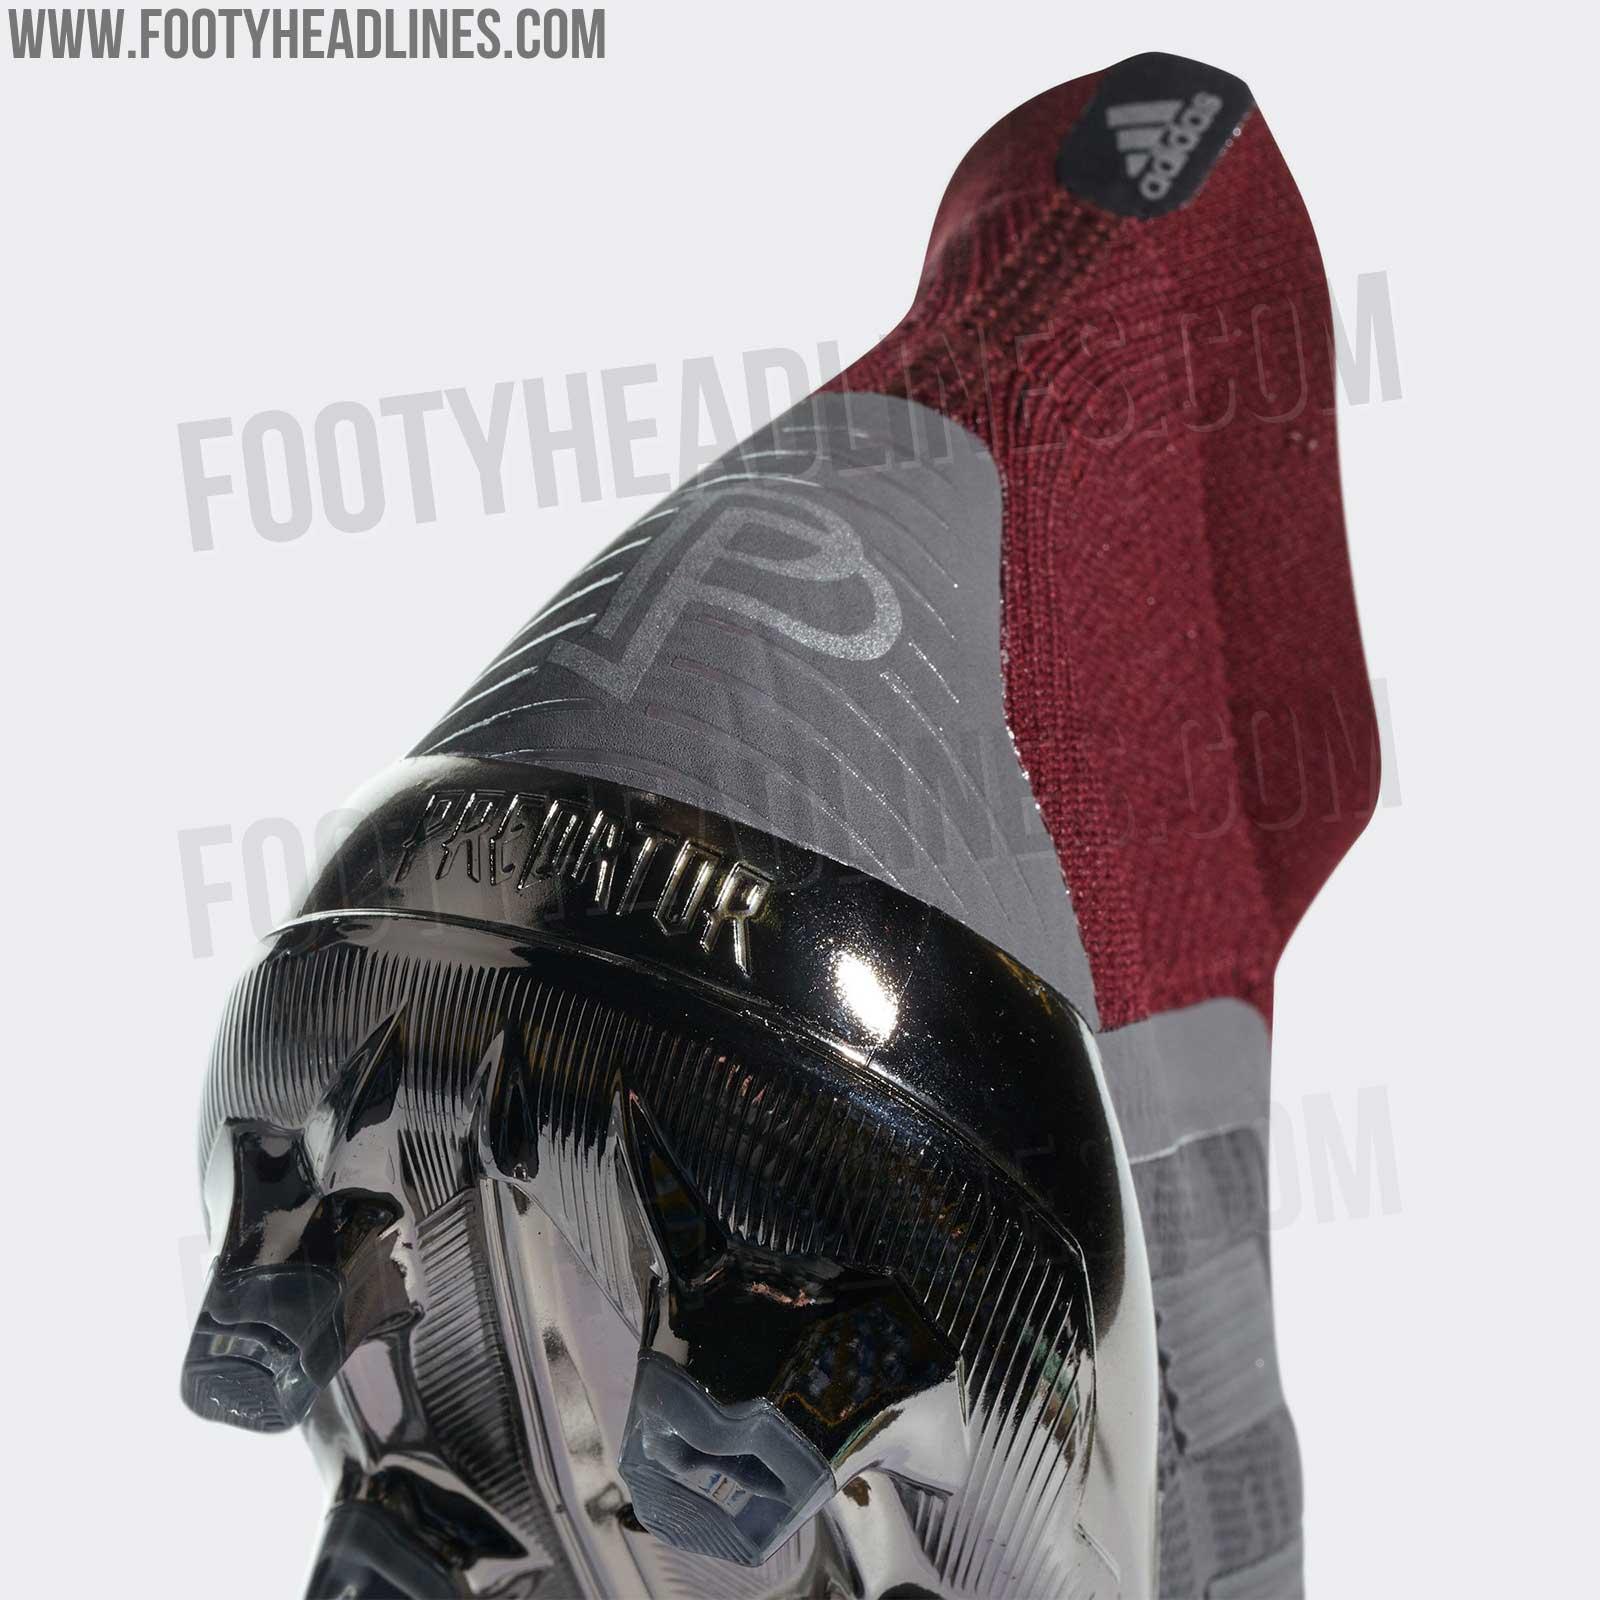 OFFICIAL: Adidas Predator 18+ Paul Pogba Signature Boots